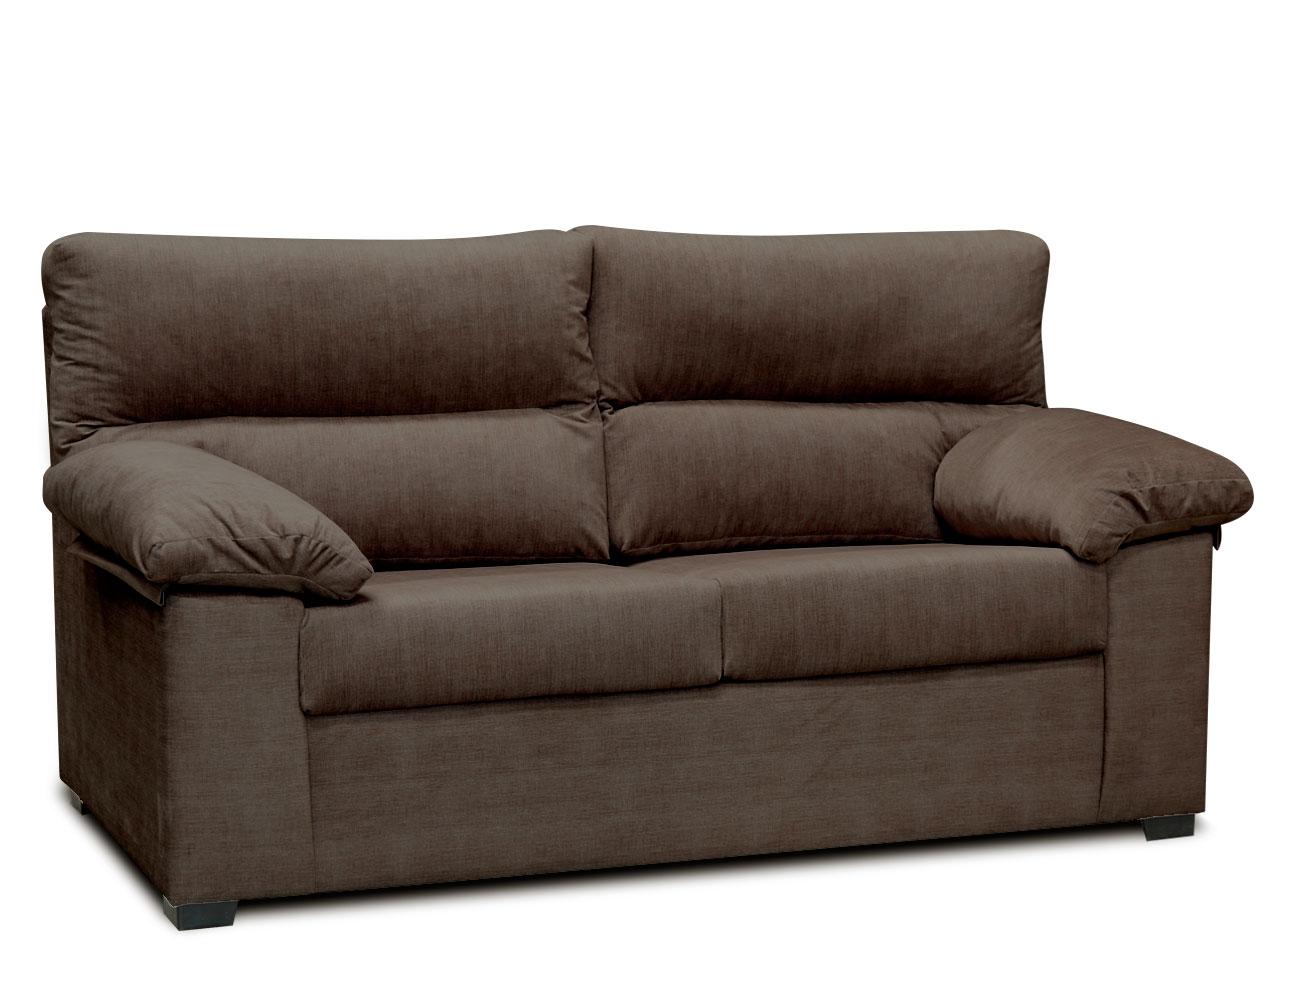 Sofa 3 plazas indiana trufa 1